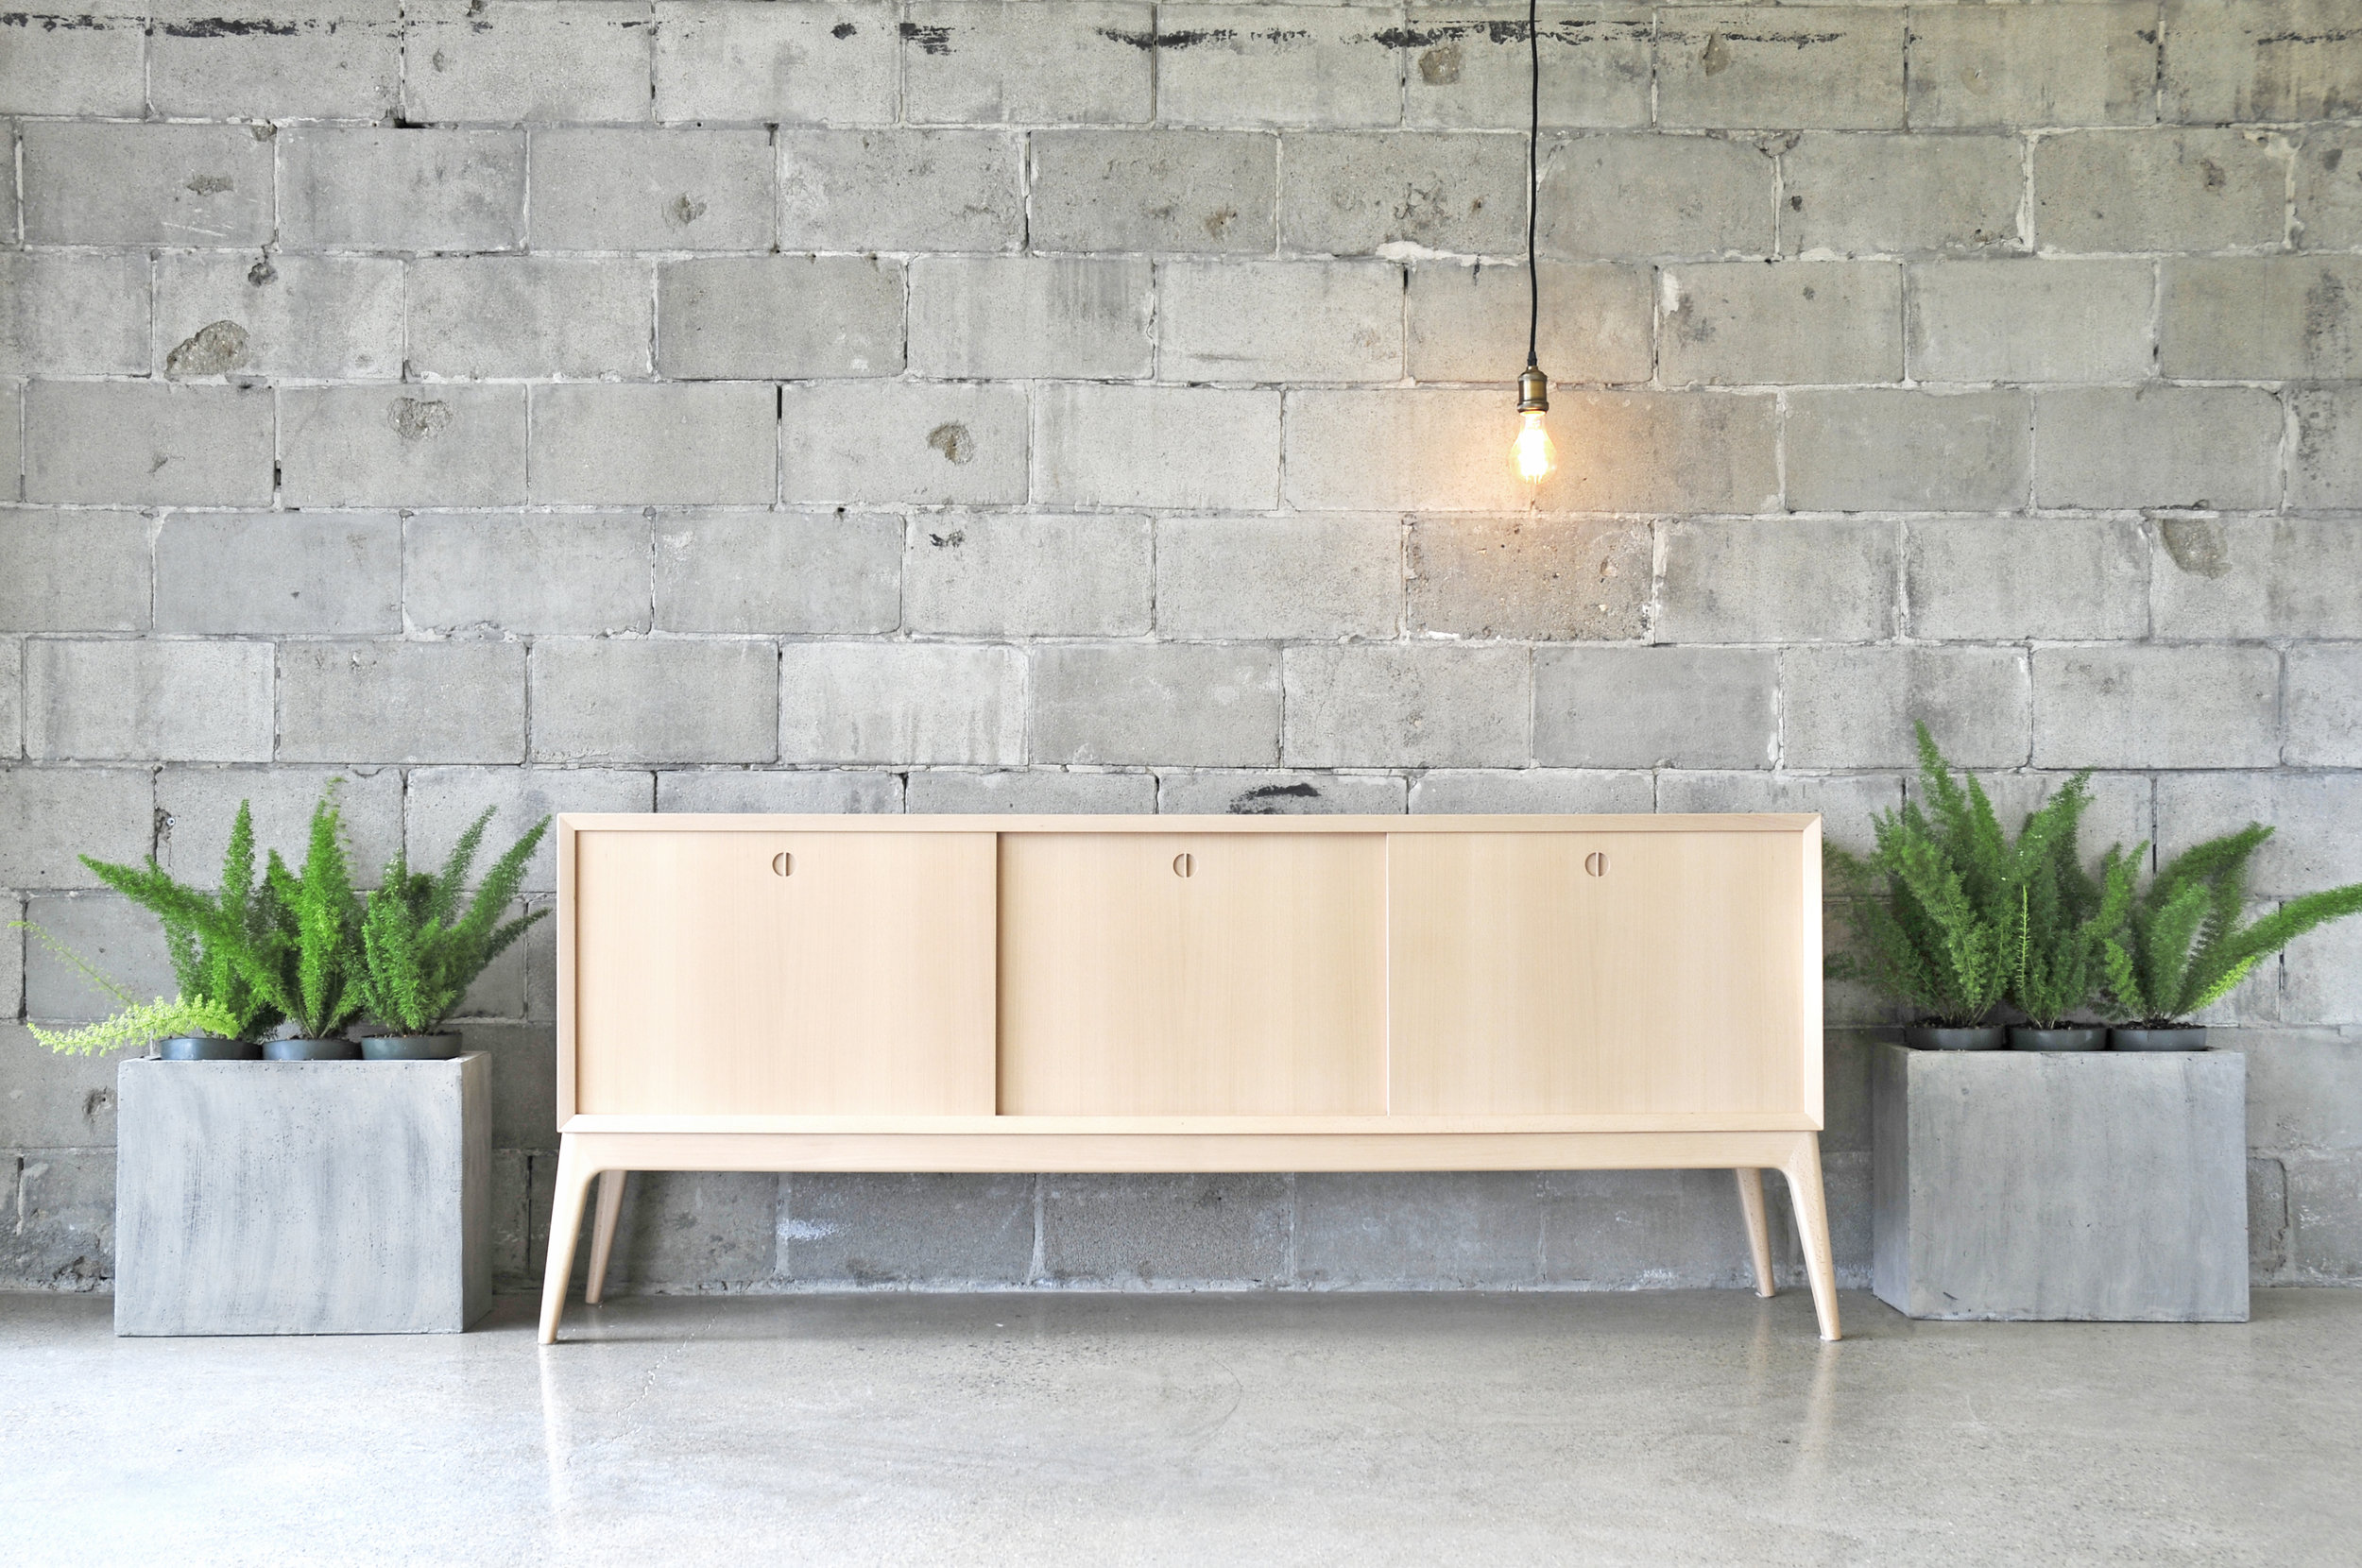 Hopper Cabinet & plants.jpg